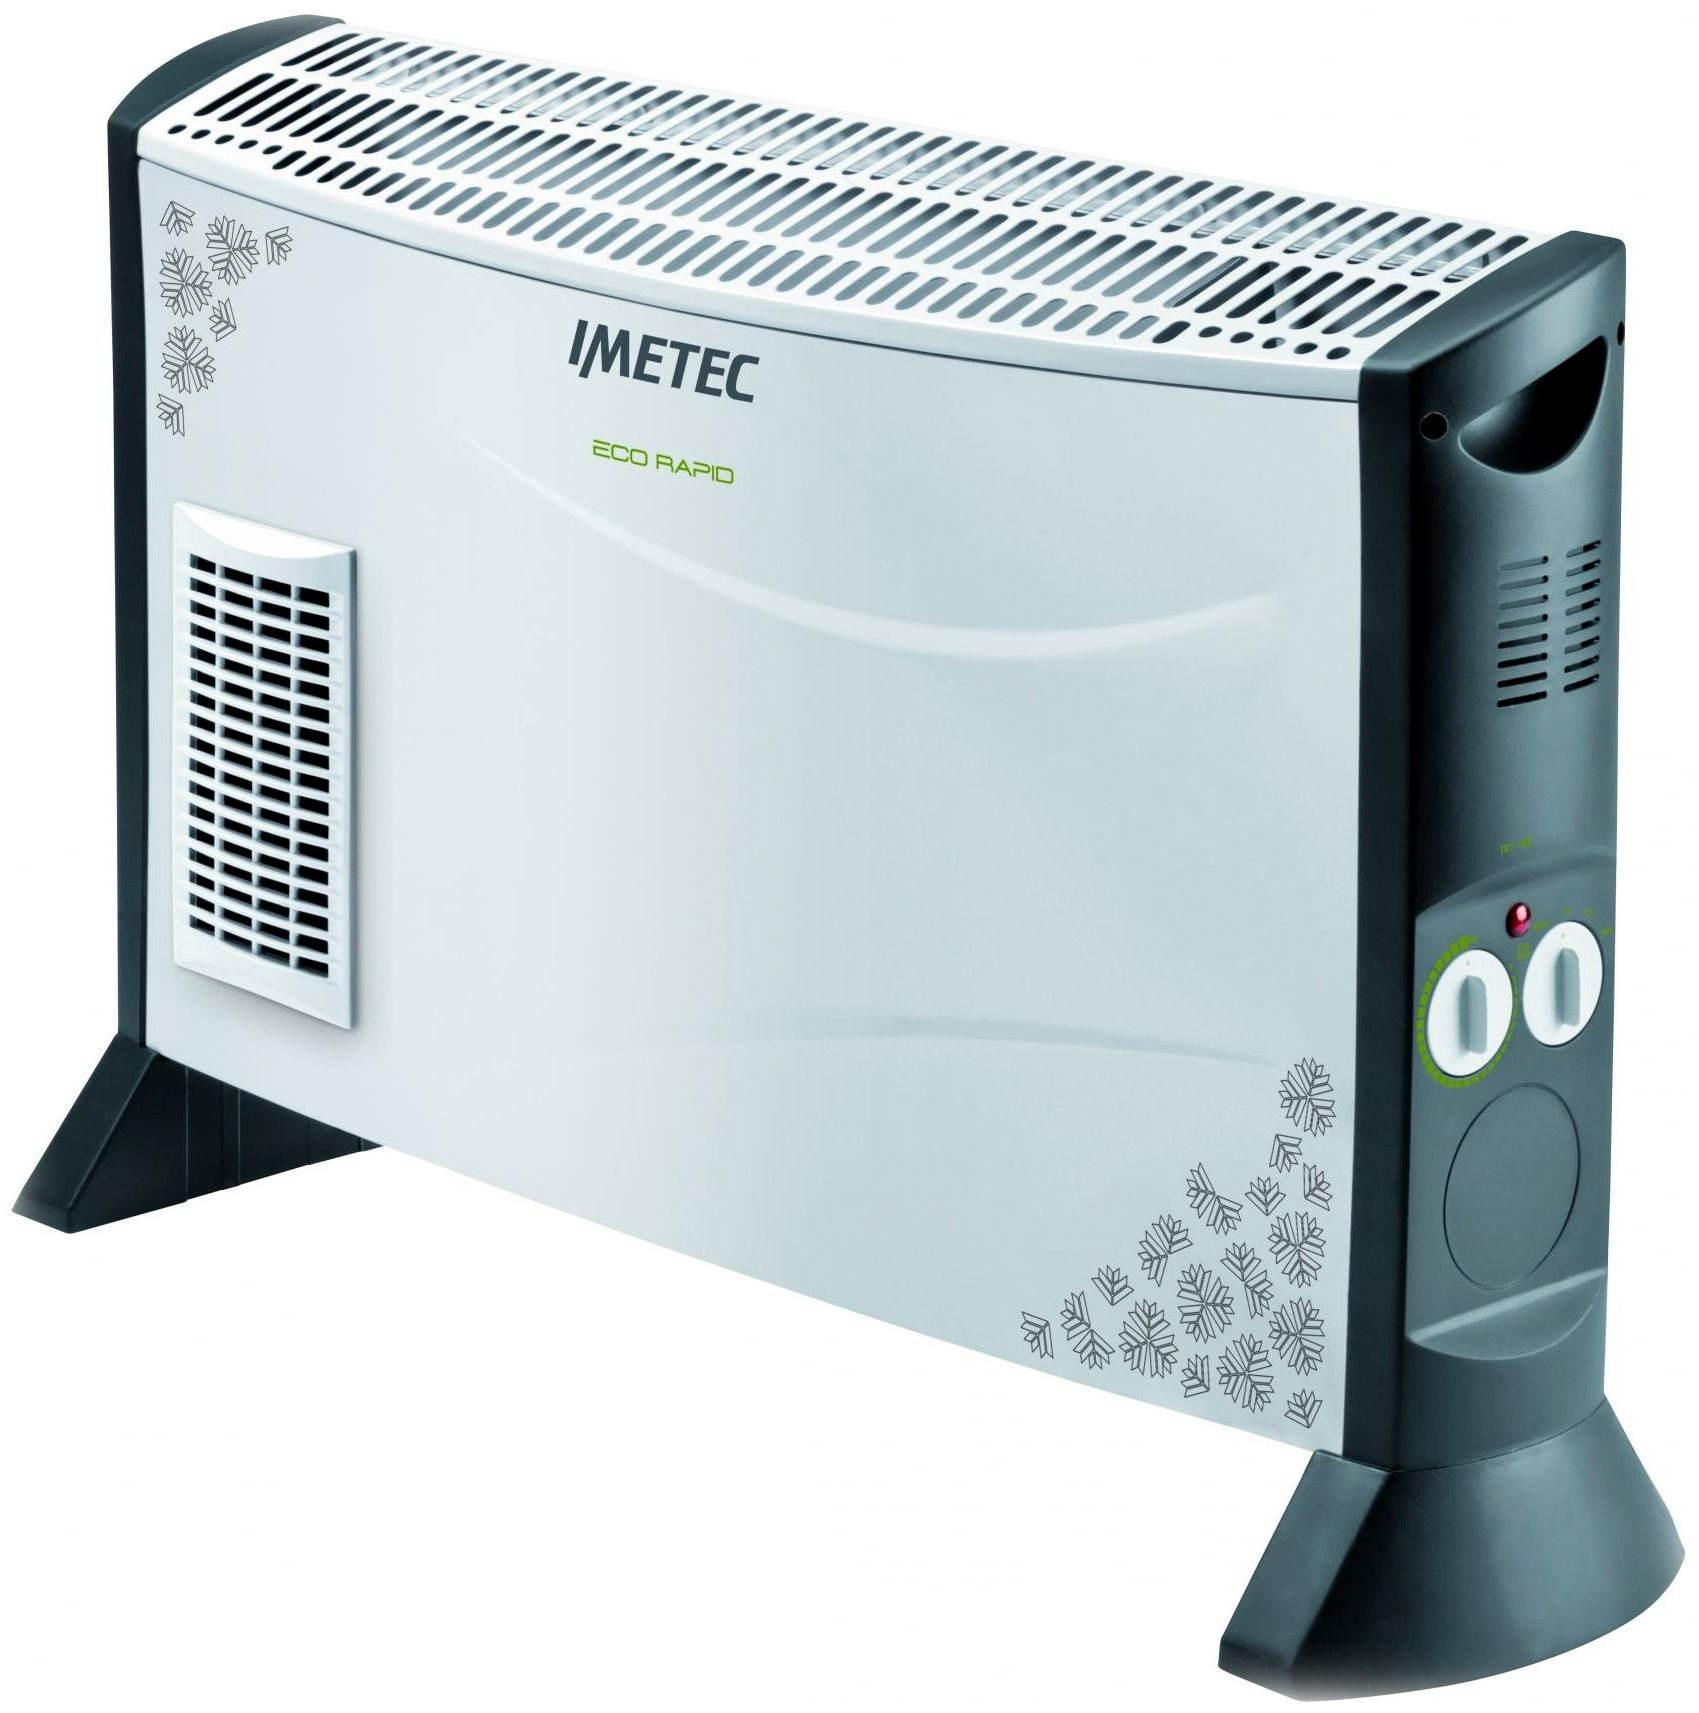 IMETEC 4006 TH1-100 ECO Rapid